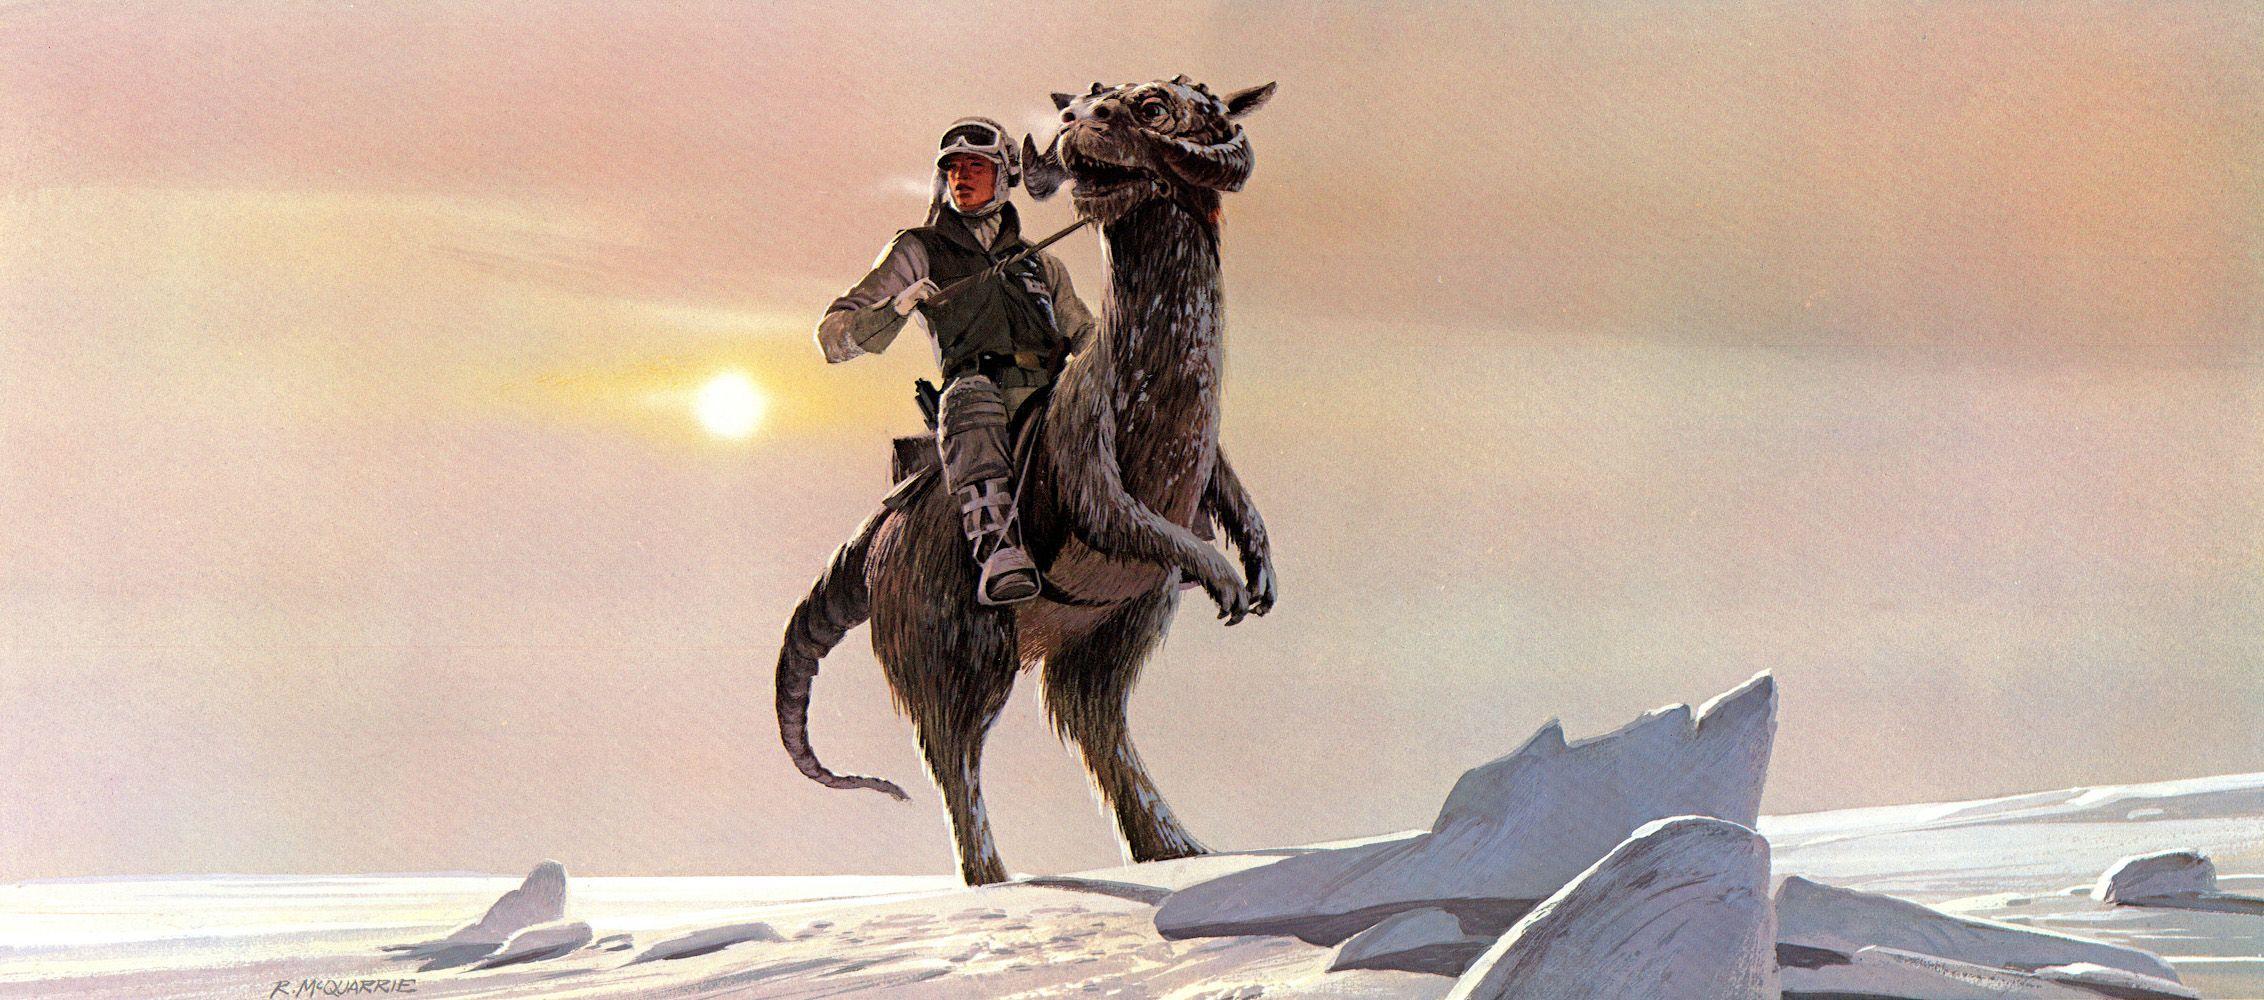 Star Wars Concept Art Star Wars Painting Star Wars Art Star Wars Illustration